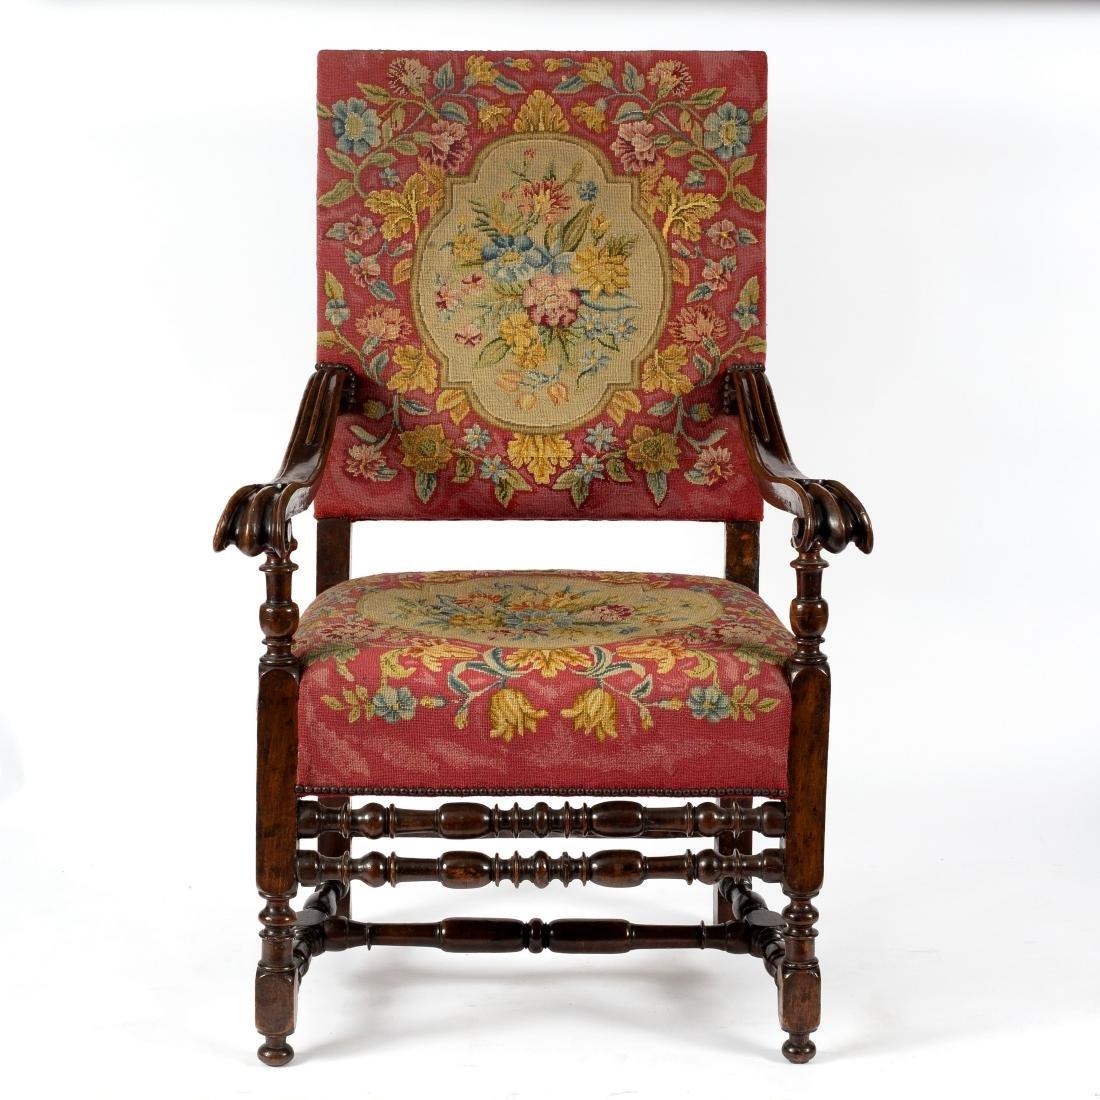 A Franco-Flemish high back open armchair, circa 1700,